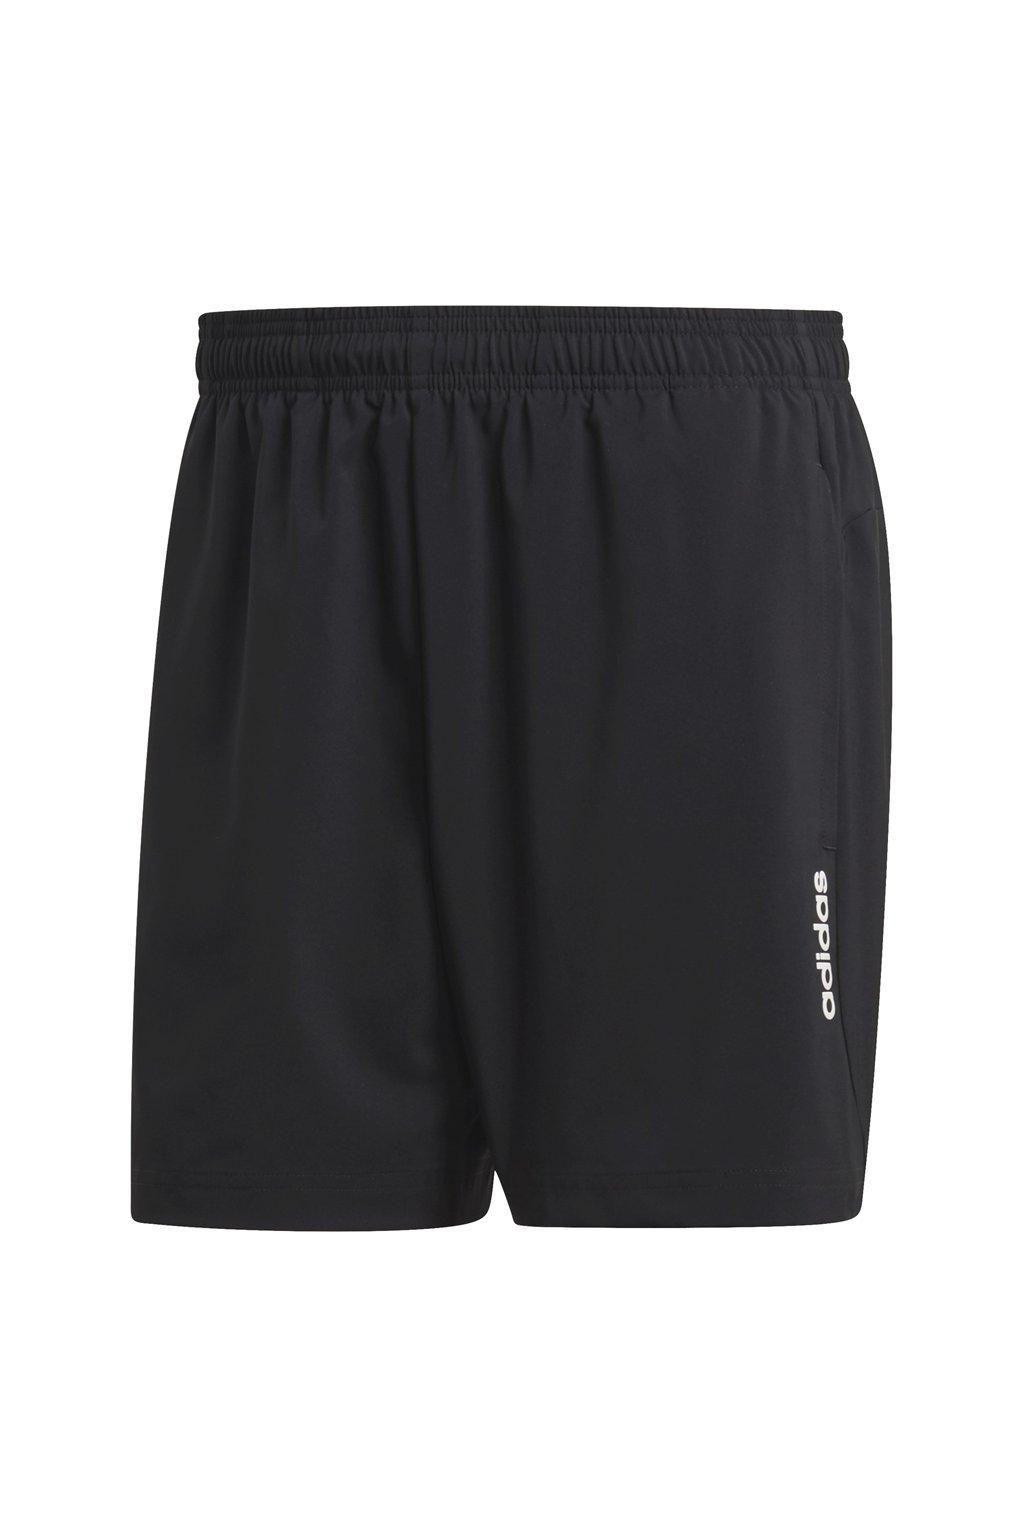 Pánske šortky Adidas Essentials Plain Chelsea Black DQ3085